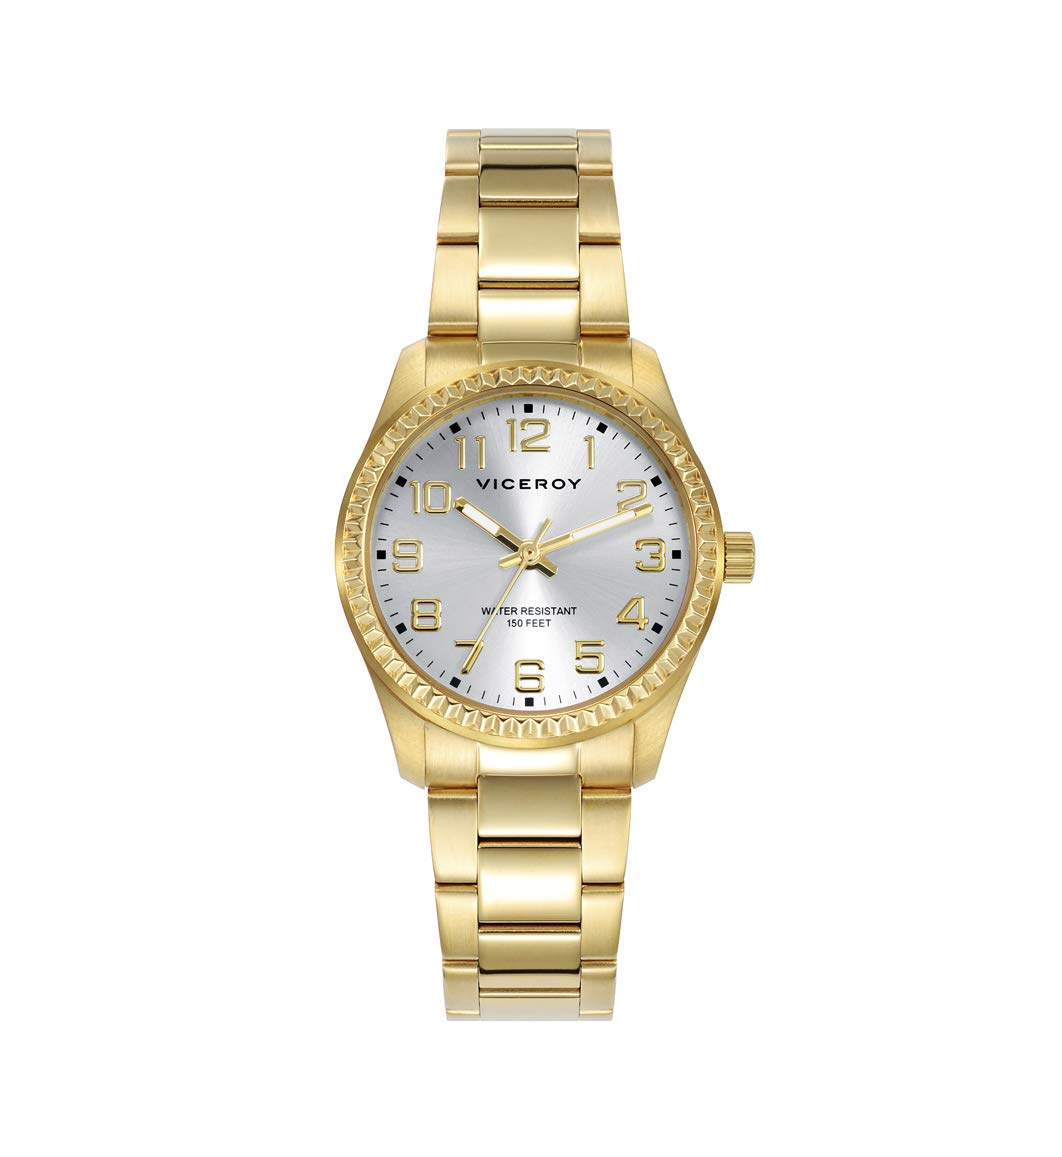 VICEROY – Reloj Acero IP Dorado Brazalete Sra Viceroy – 40860-27